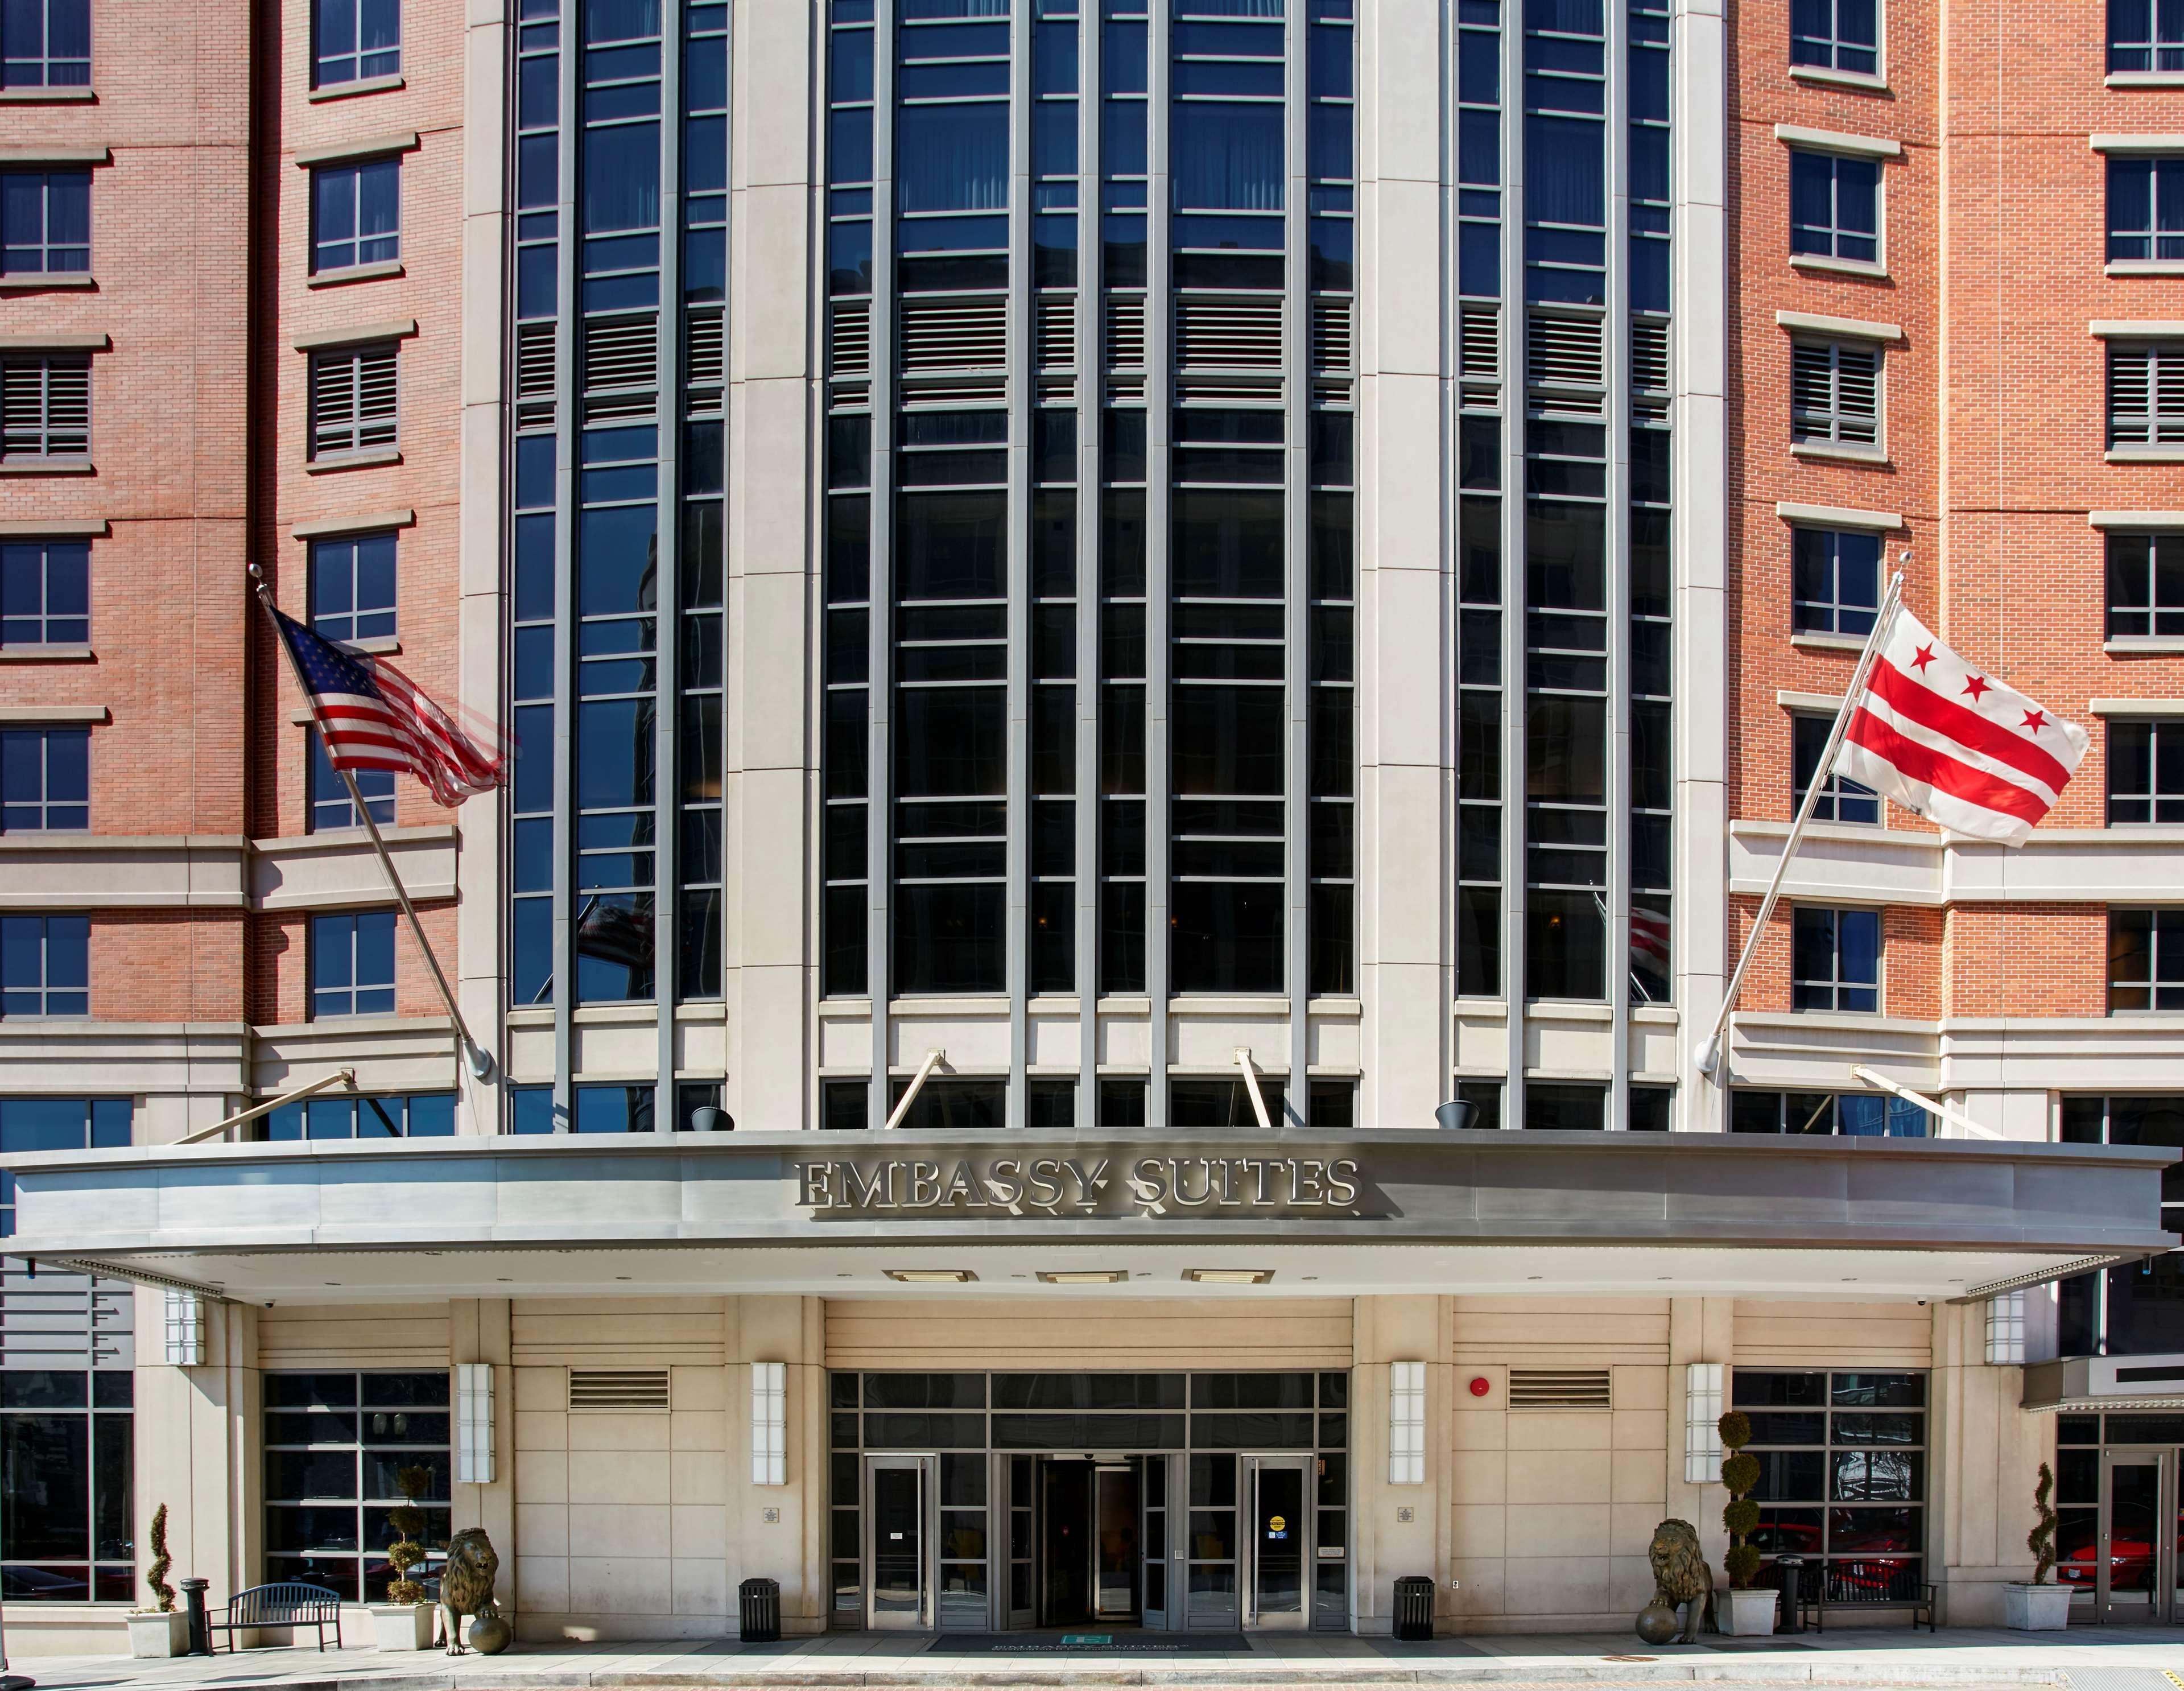 Embassy Suites by Hilton Washington DC Convention Center image 1